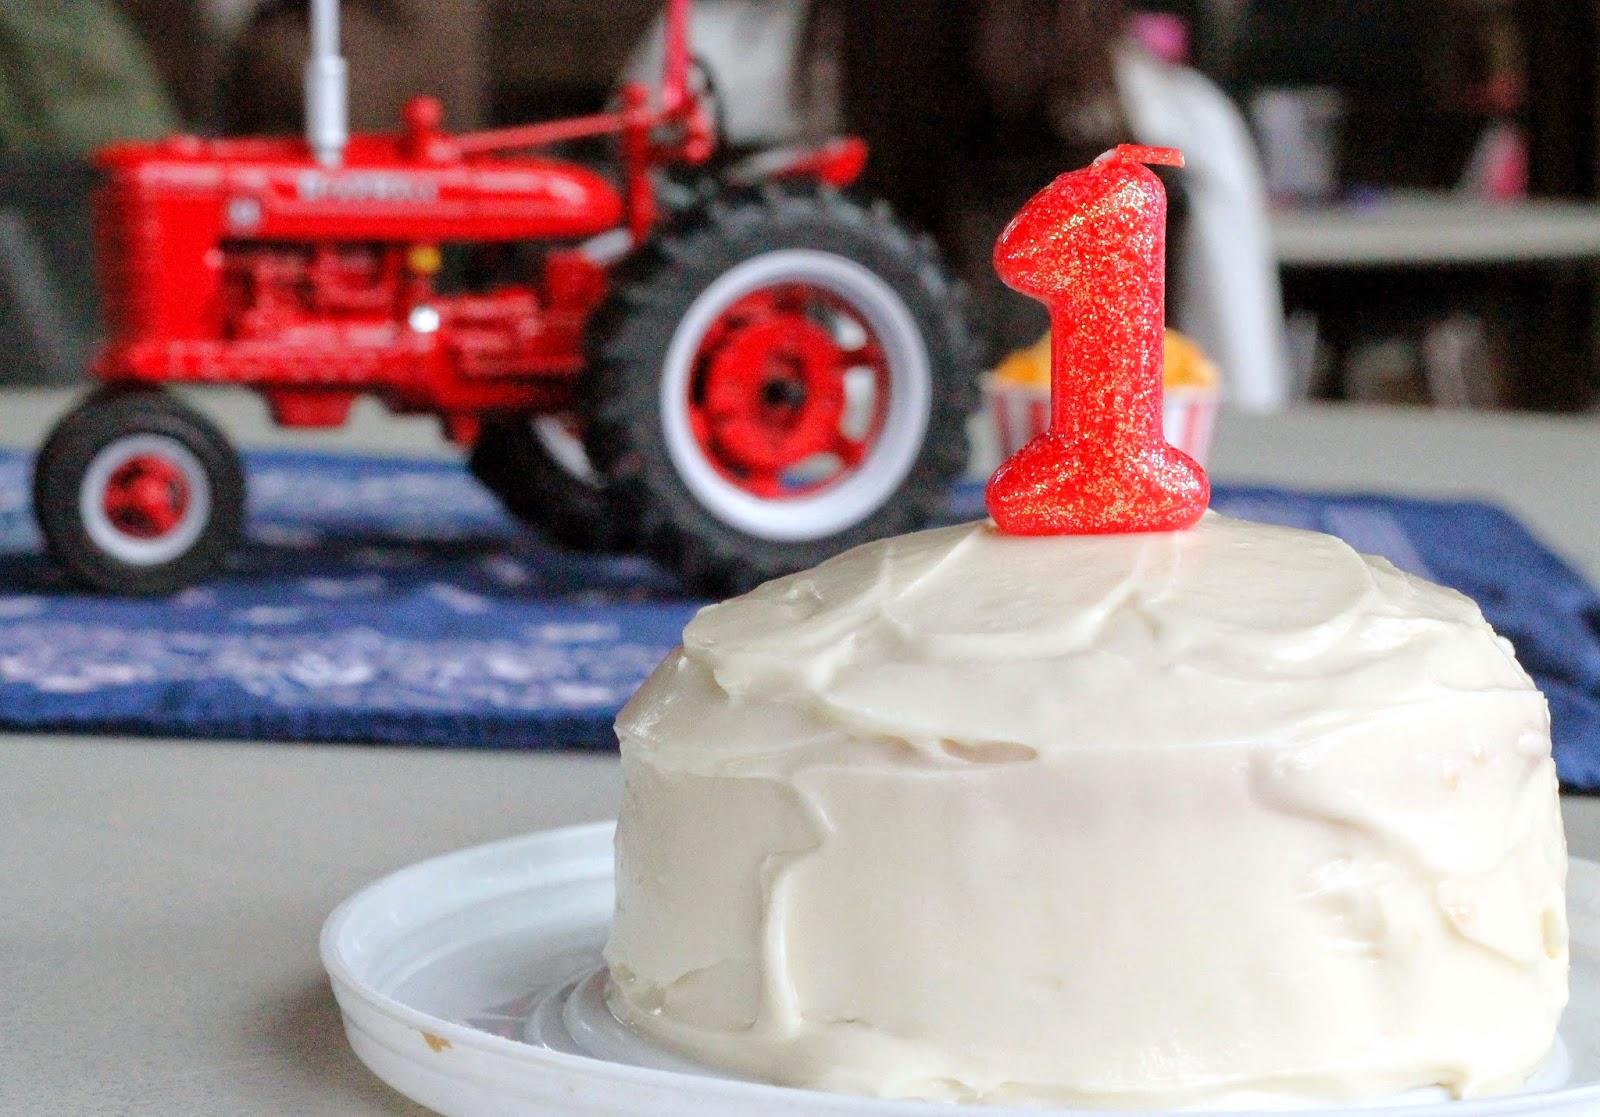 Farmall Decorating Ideas : Farmall st birthday party everyday magazine